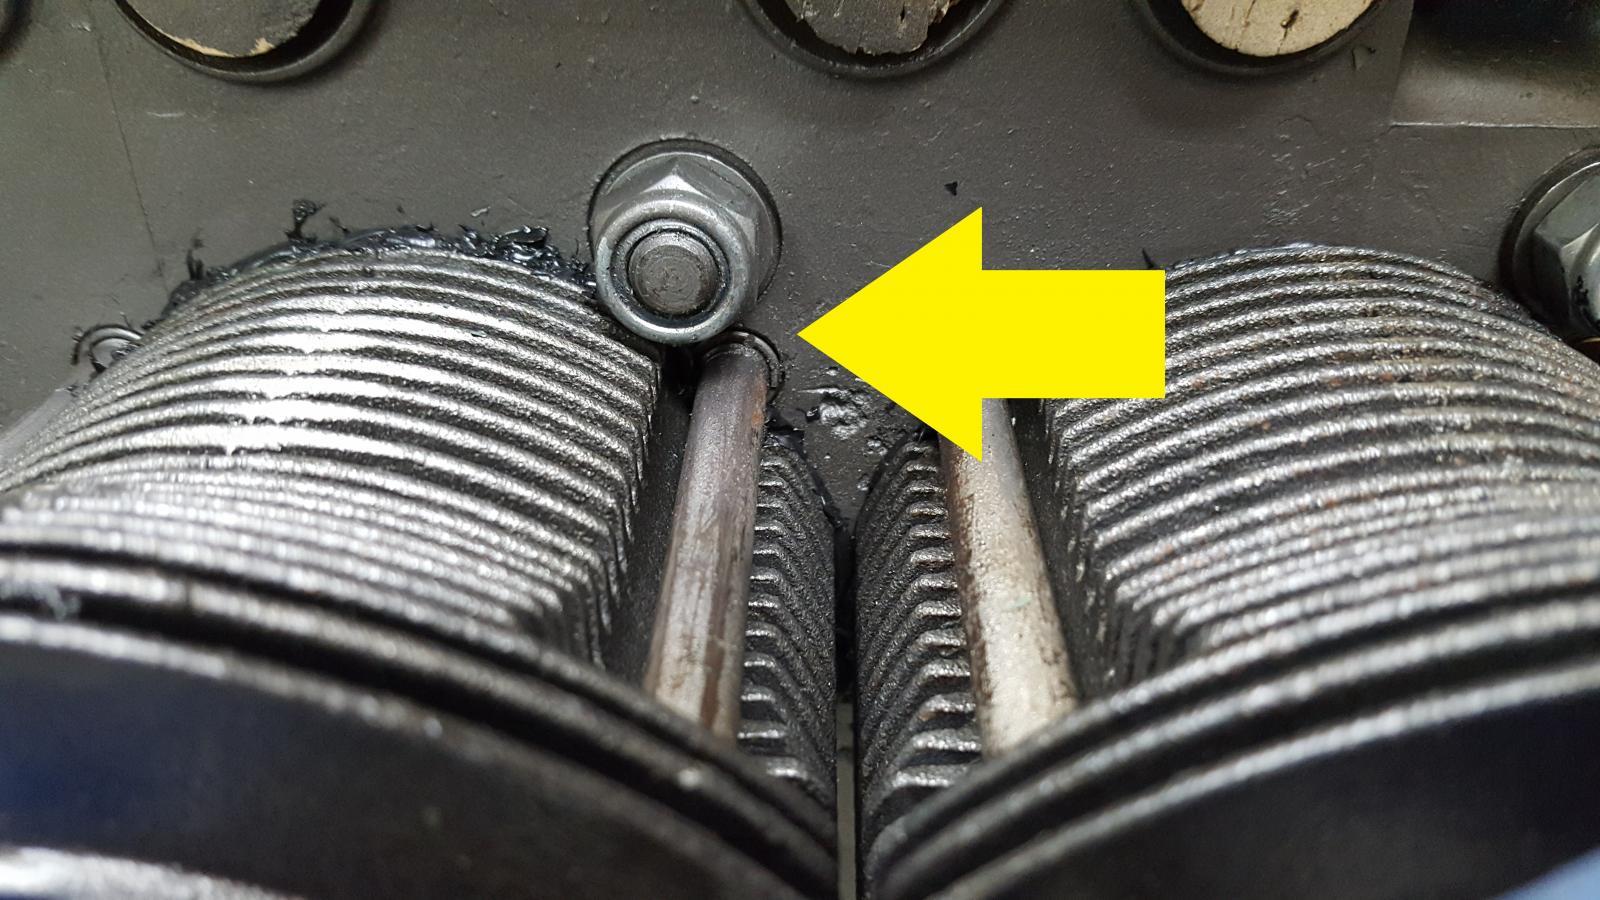 Cylinder heat deflector problem